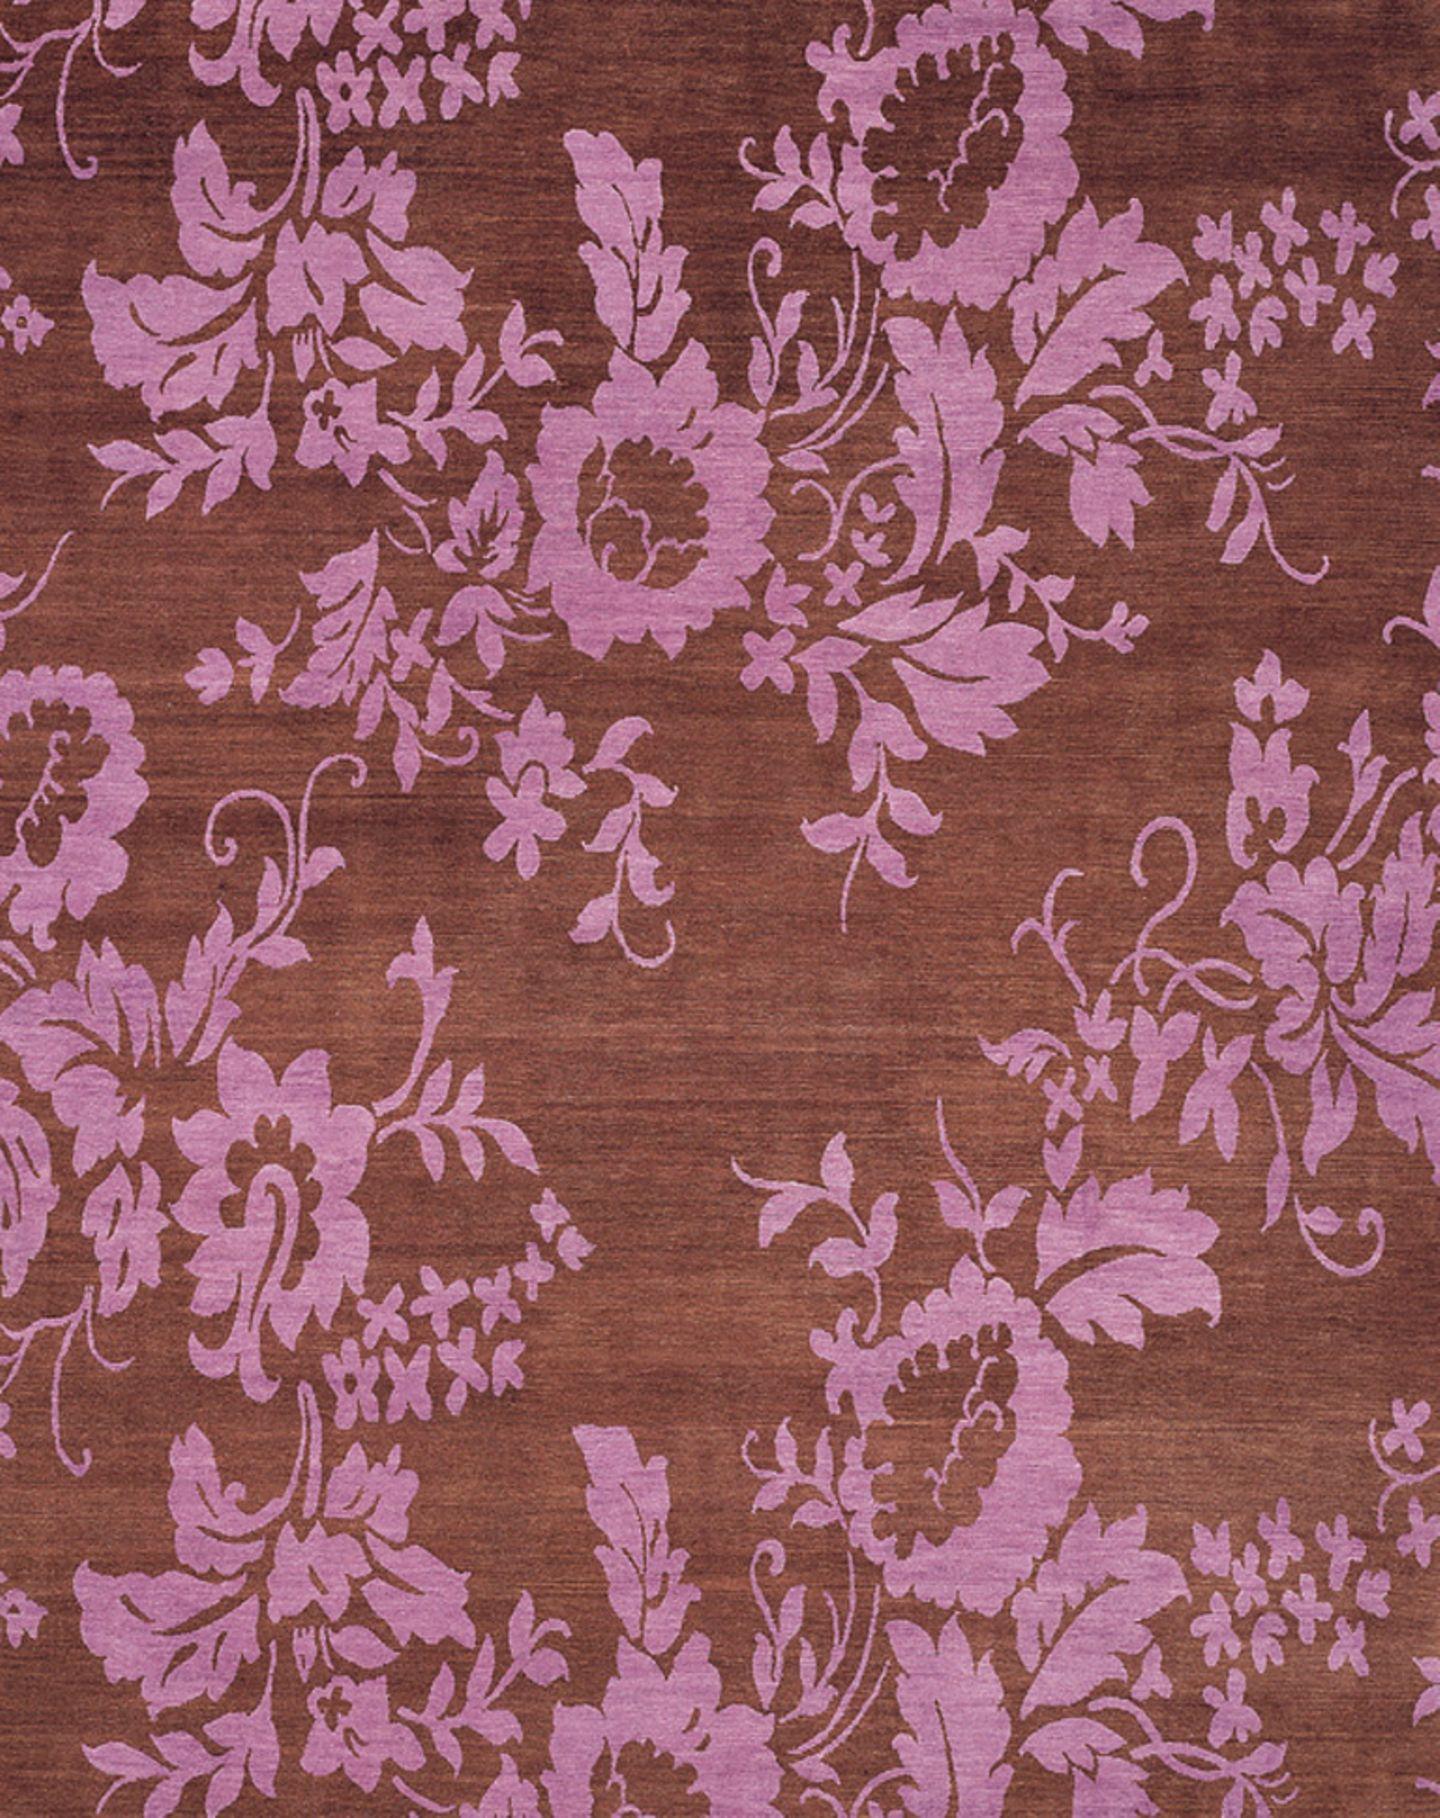 "Blumenteppich ""Carmelina"" von The Rug Company"